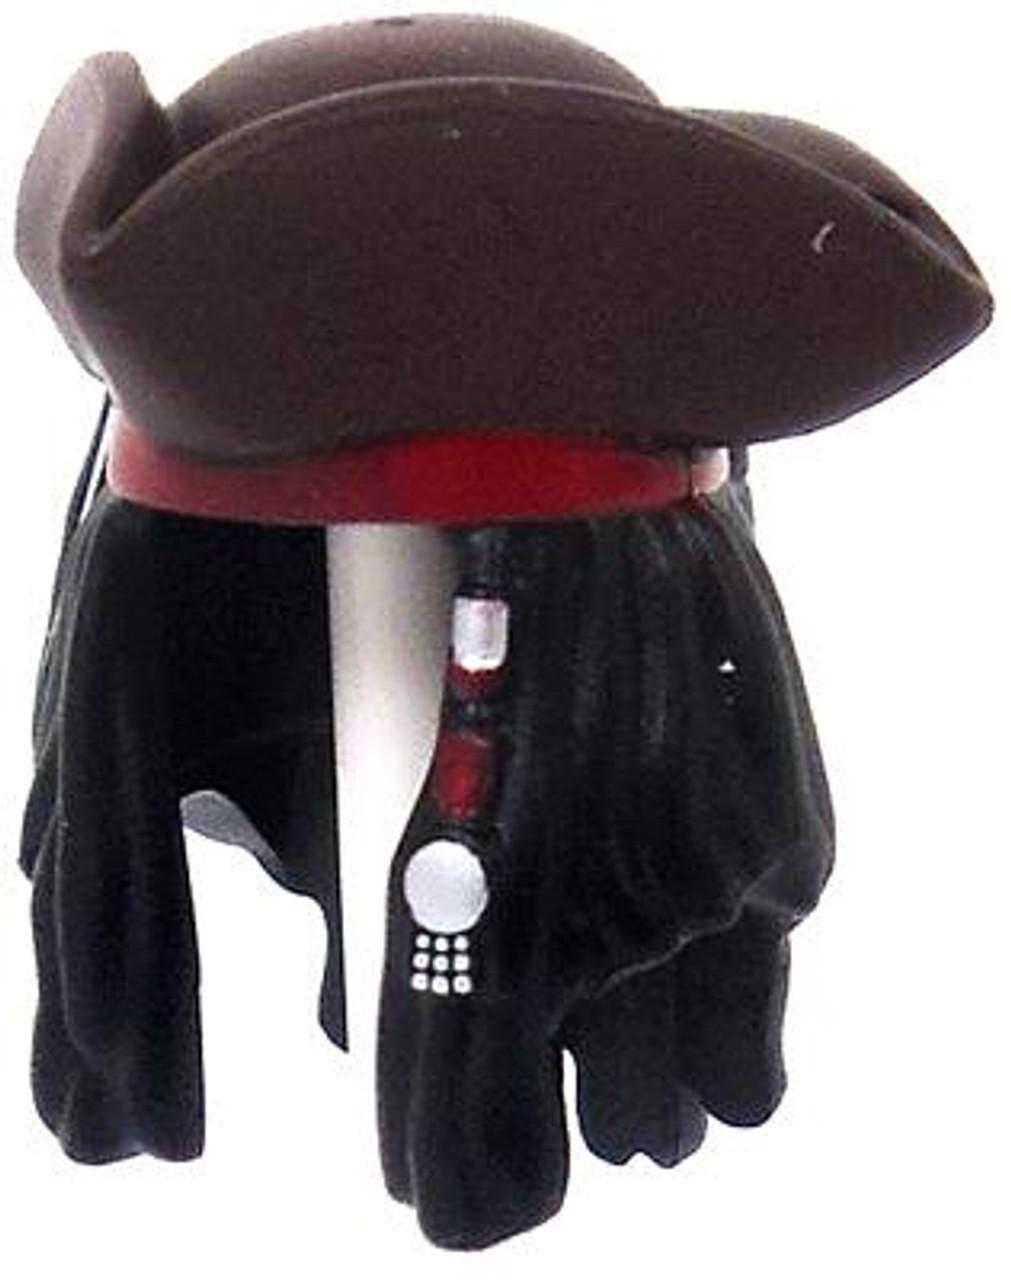 LEGO Pirates of the Caribbean Black Dreadlocks with Tricorn Hat & Maroon Headband Loose Hair [Loose]